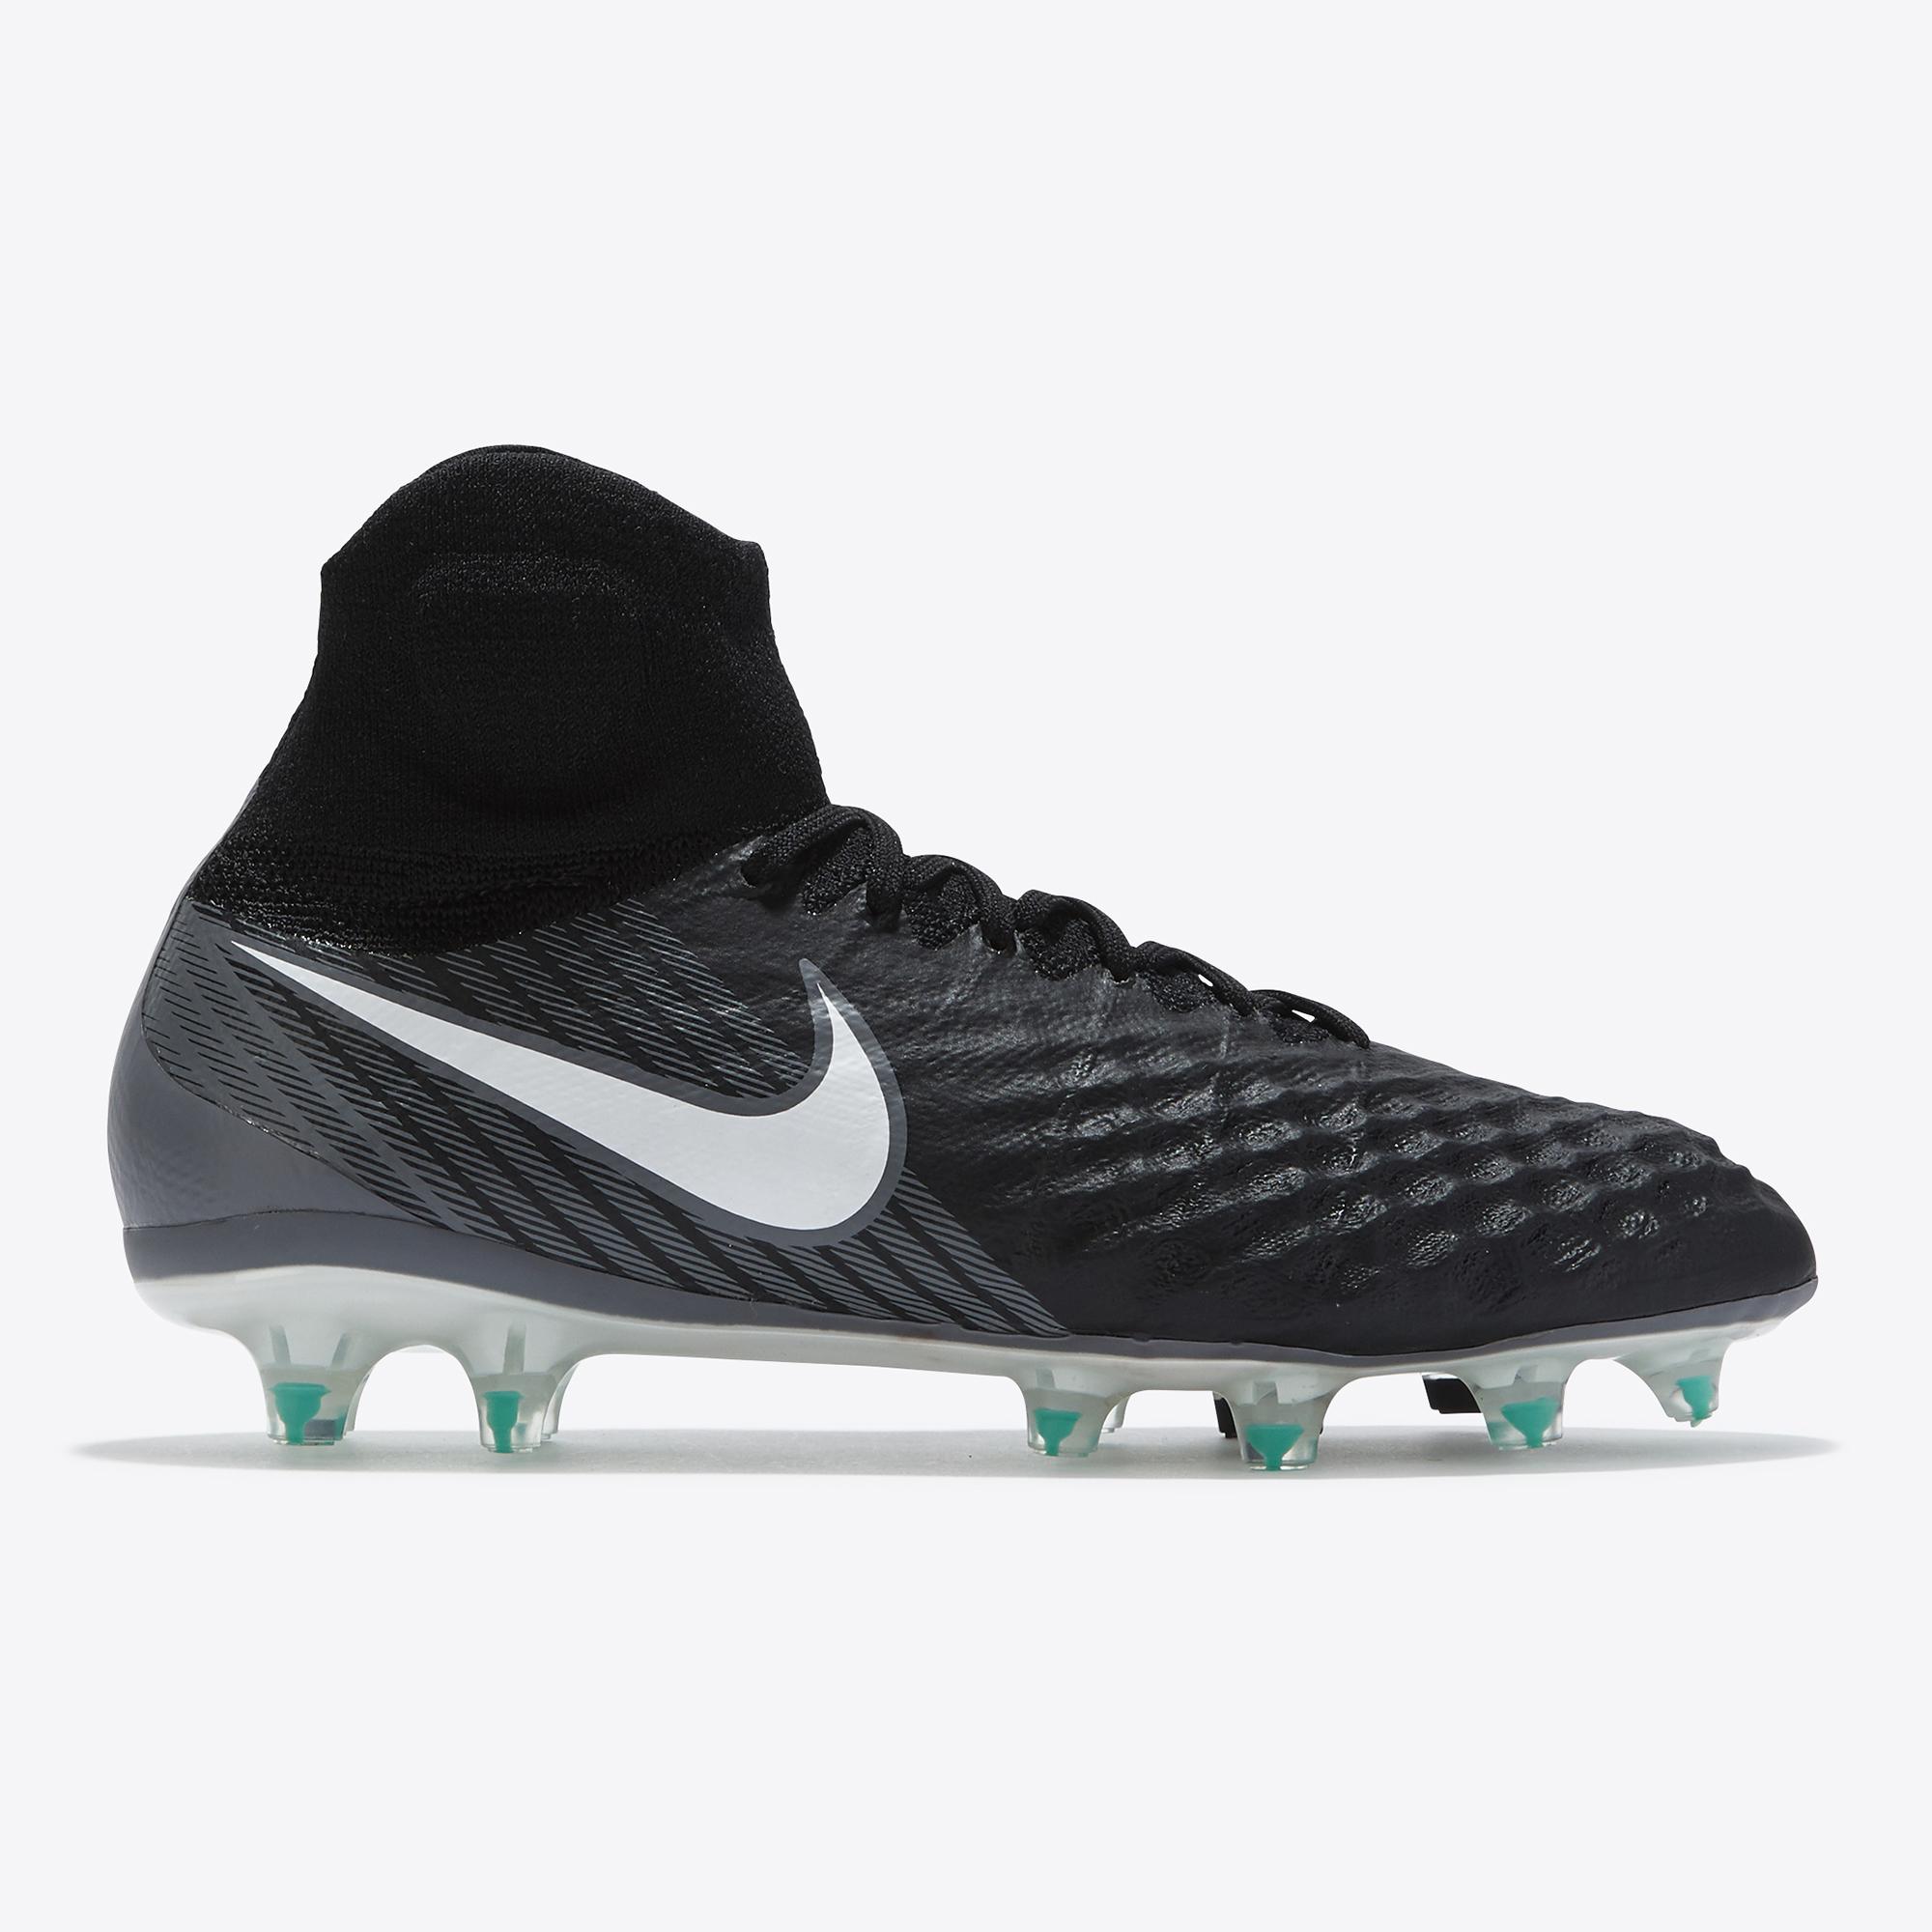 Nike Magista Obra II Firm Ground Football Boots - Black/White/Dark Gre